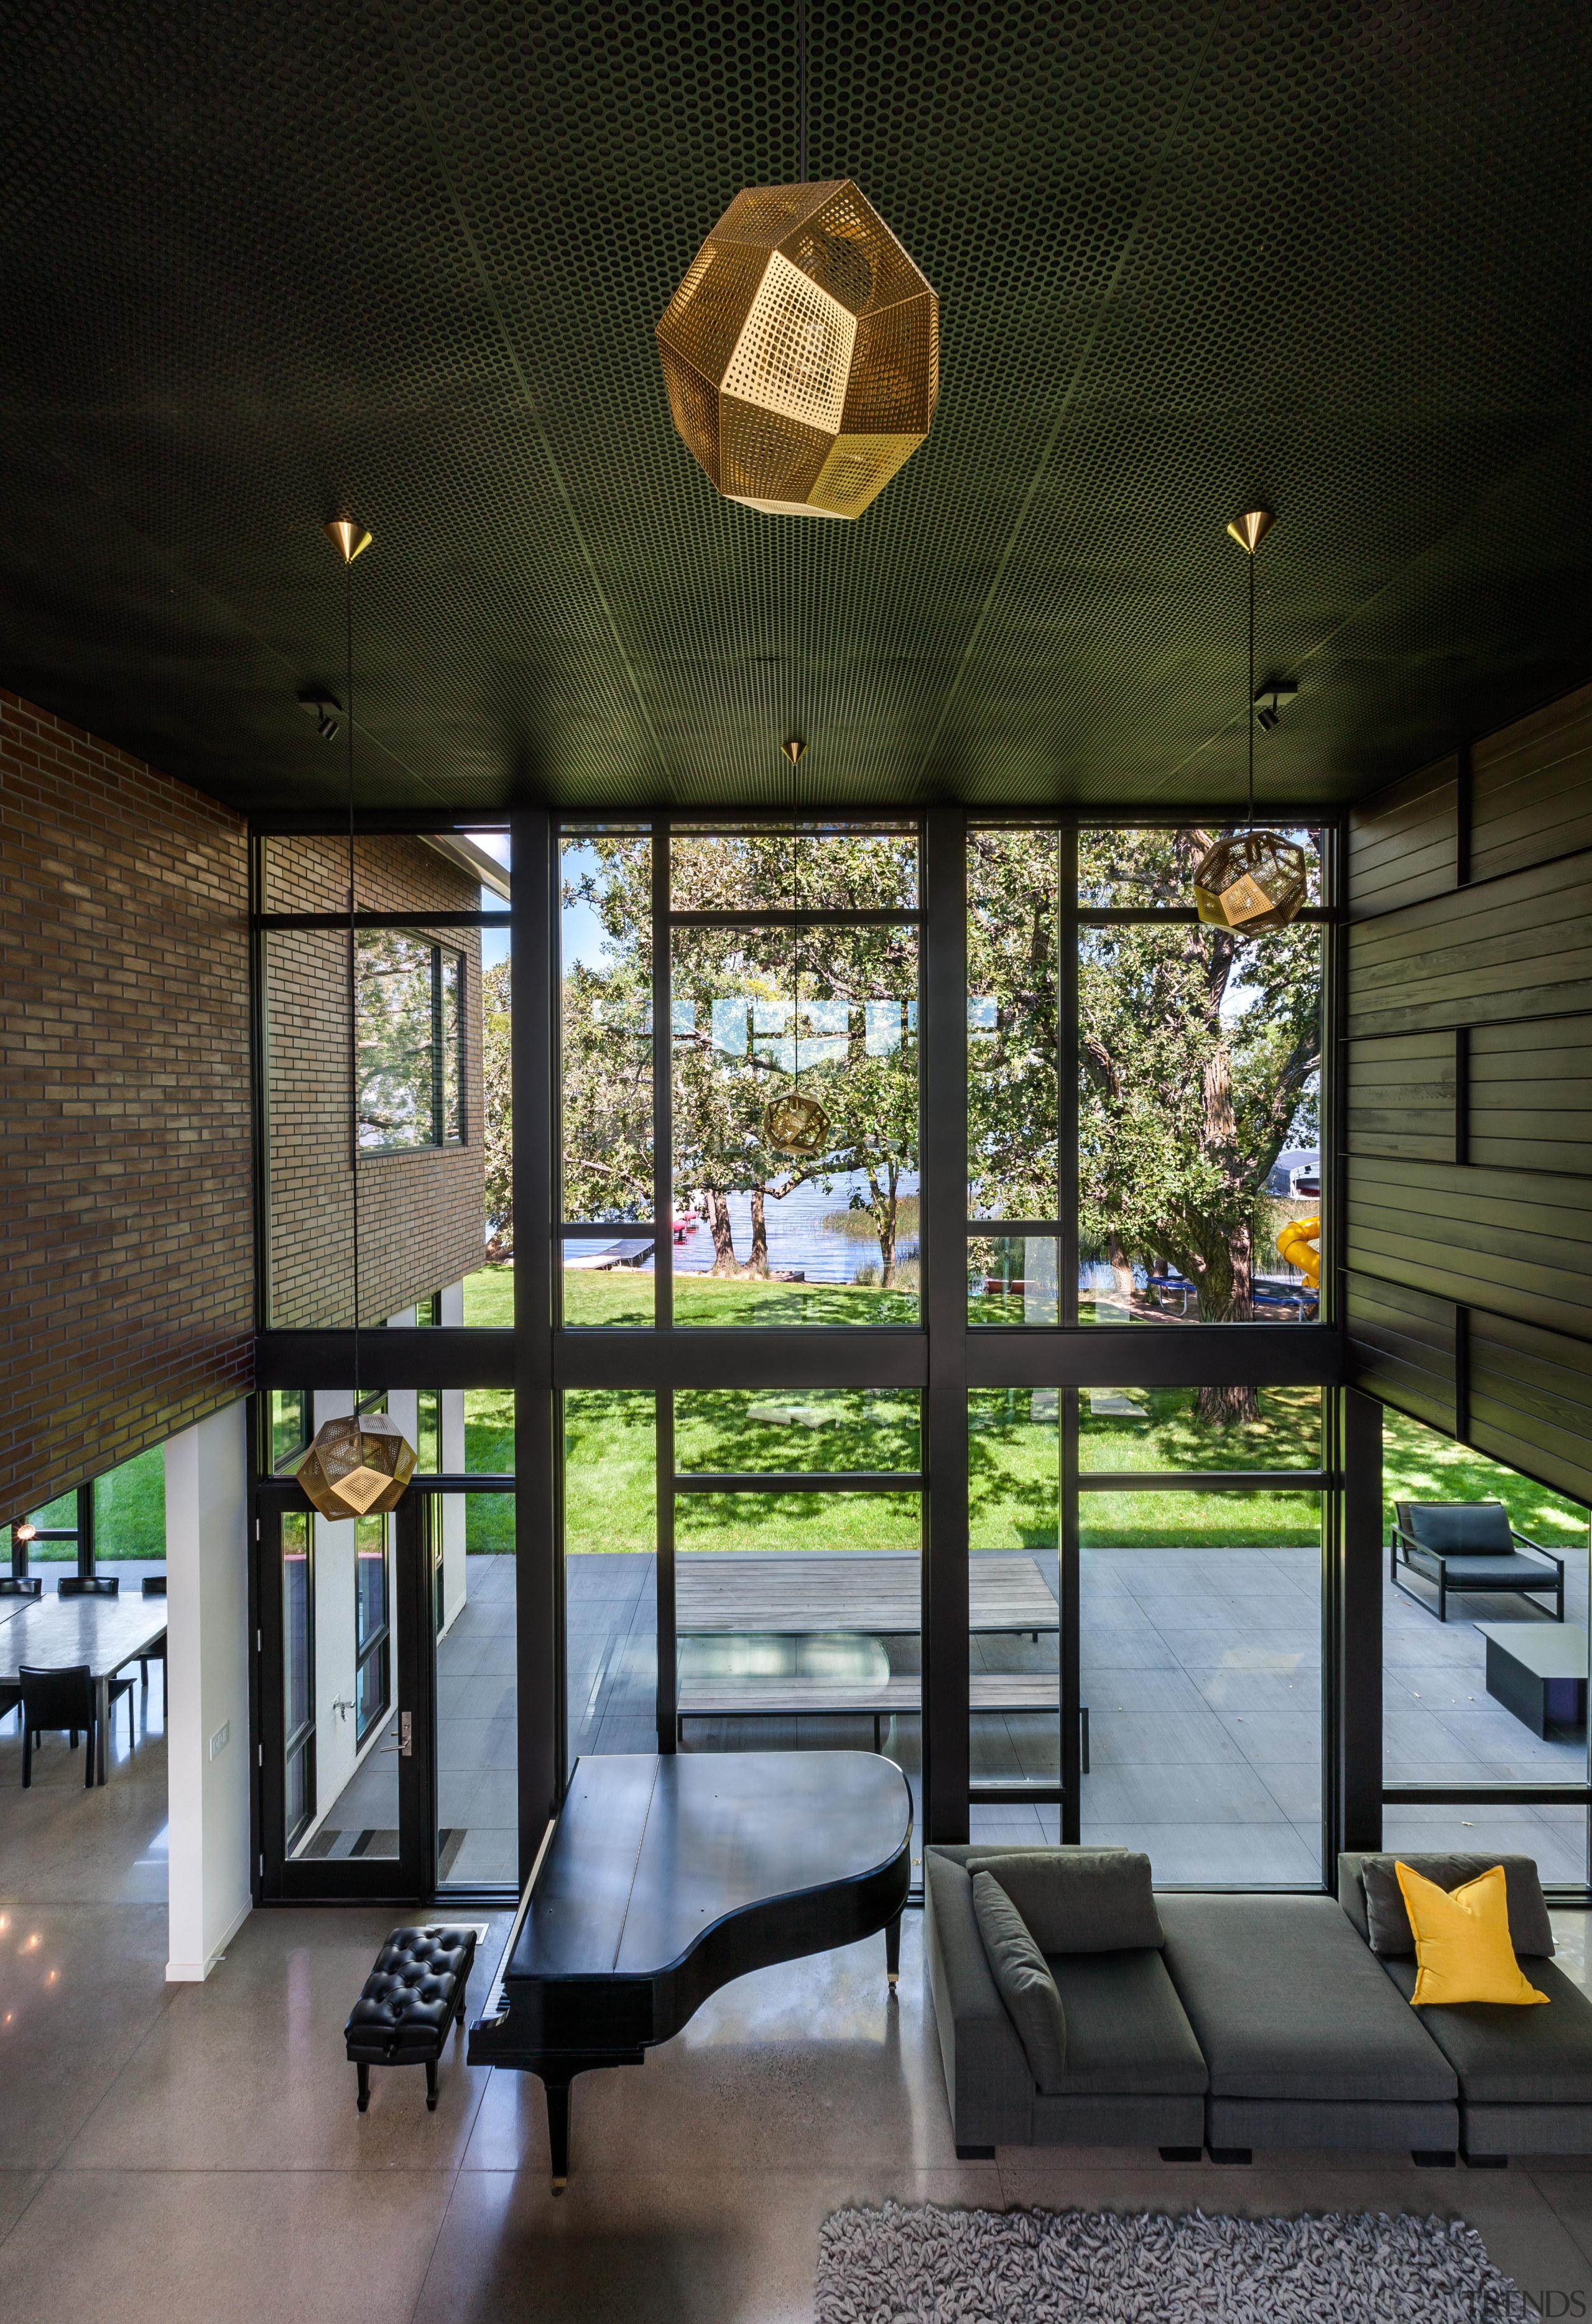 Despite the hard surfaces such as the concrete architecture, home, house, interior design, lobby, black, piano, windows, lighting, Altus Architecture